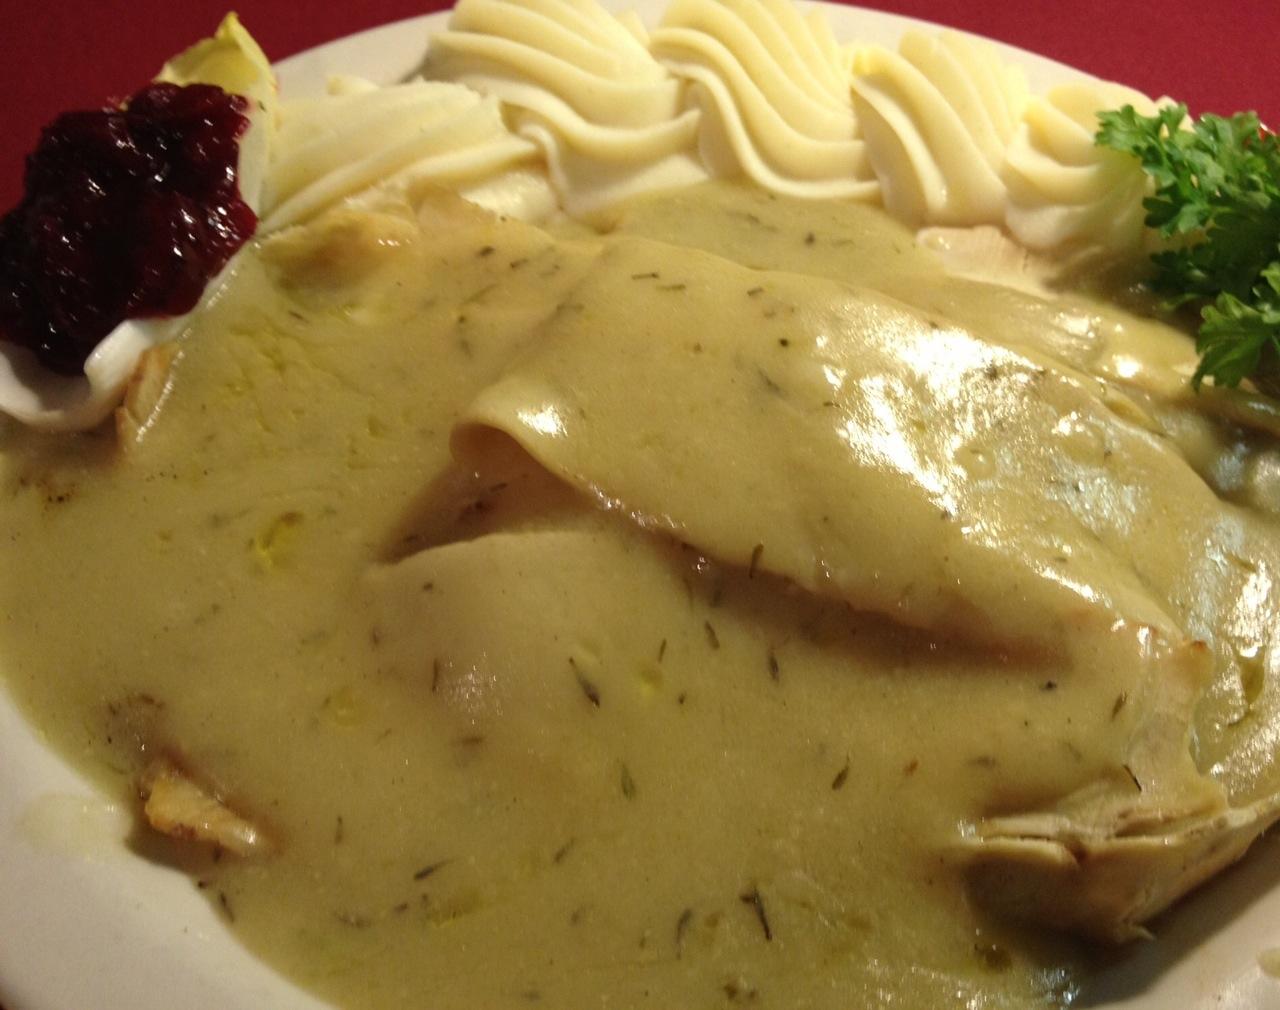 Roasted Hot Turkey Sandwich with Homemade Gravy ...Salad